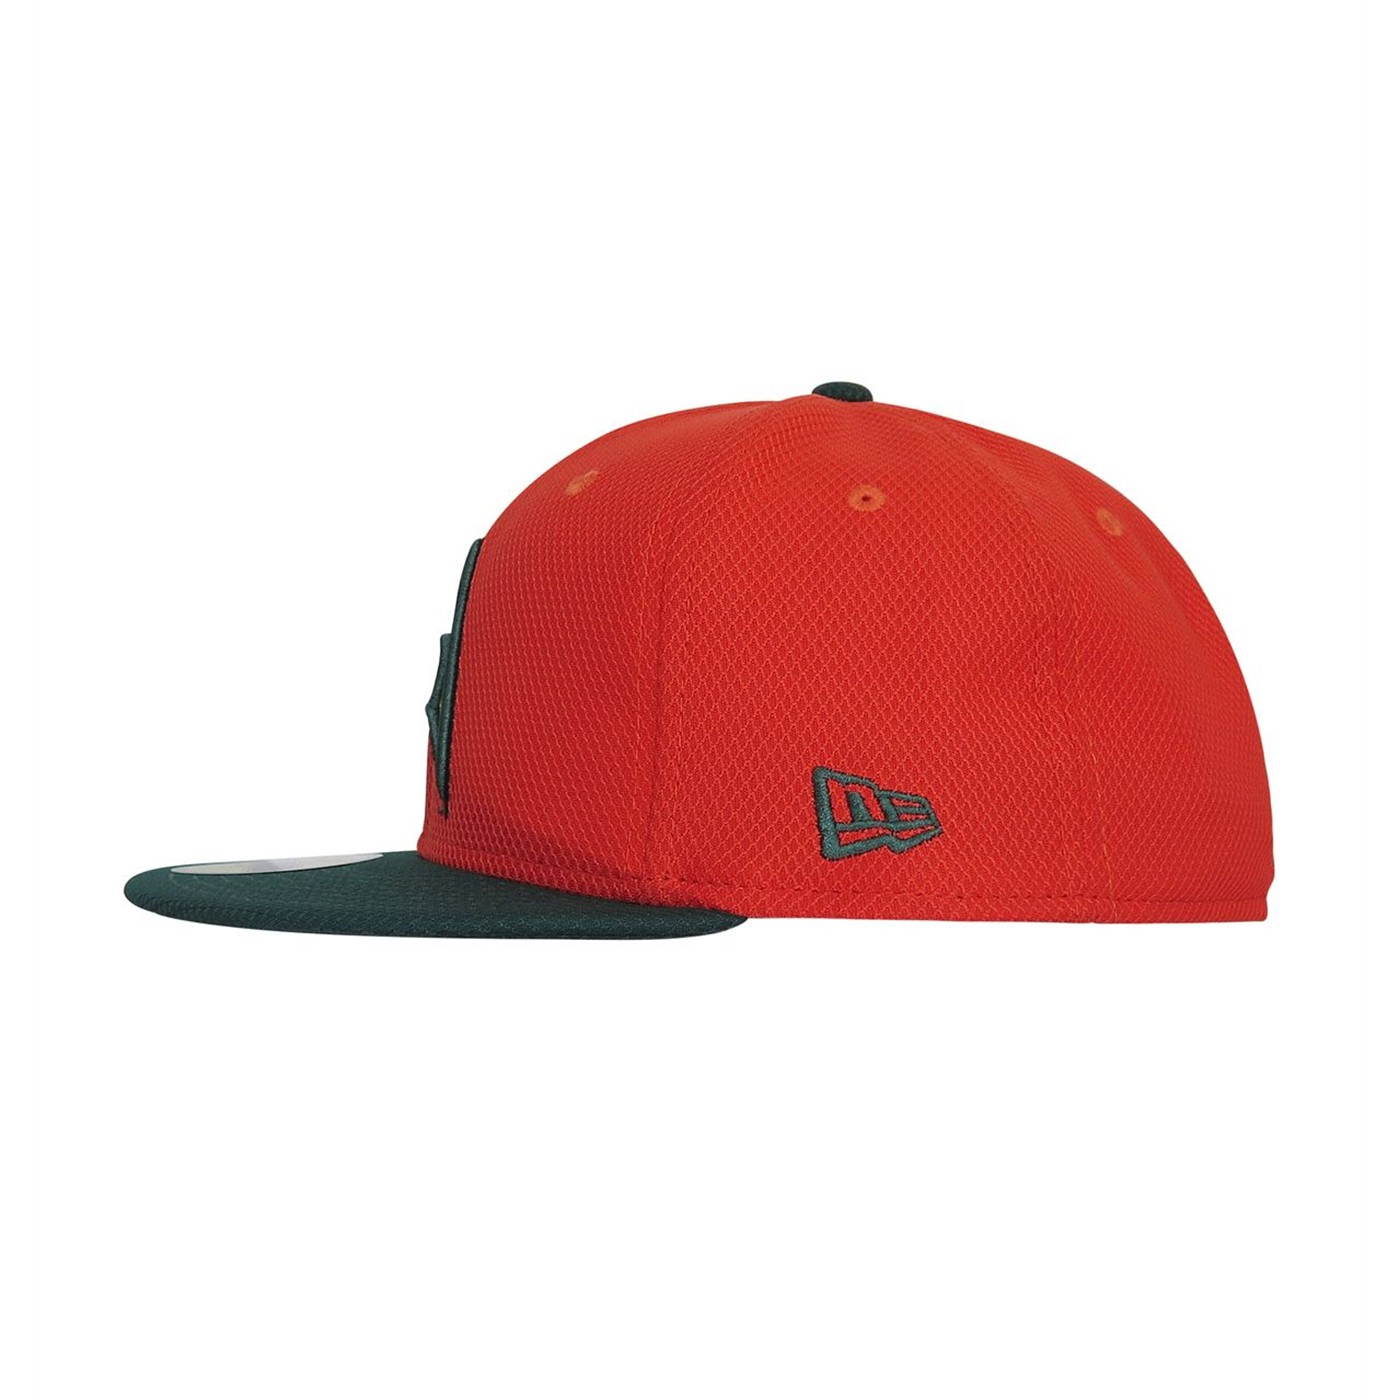 Aquaman Symbol Orange 59Fifty Fitted Hat